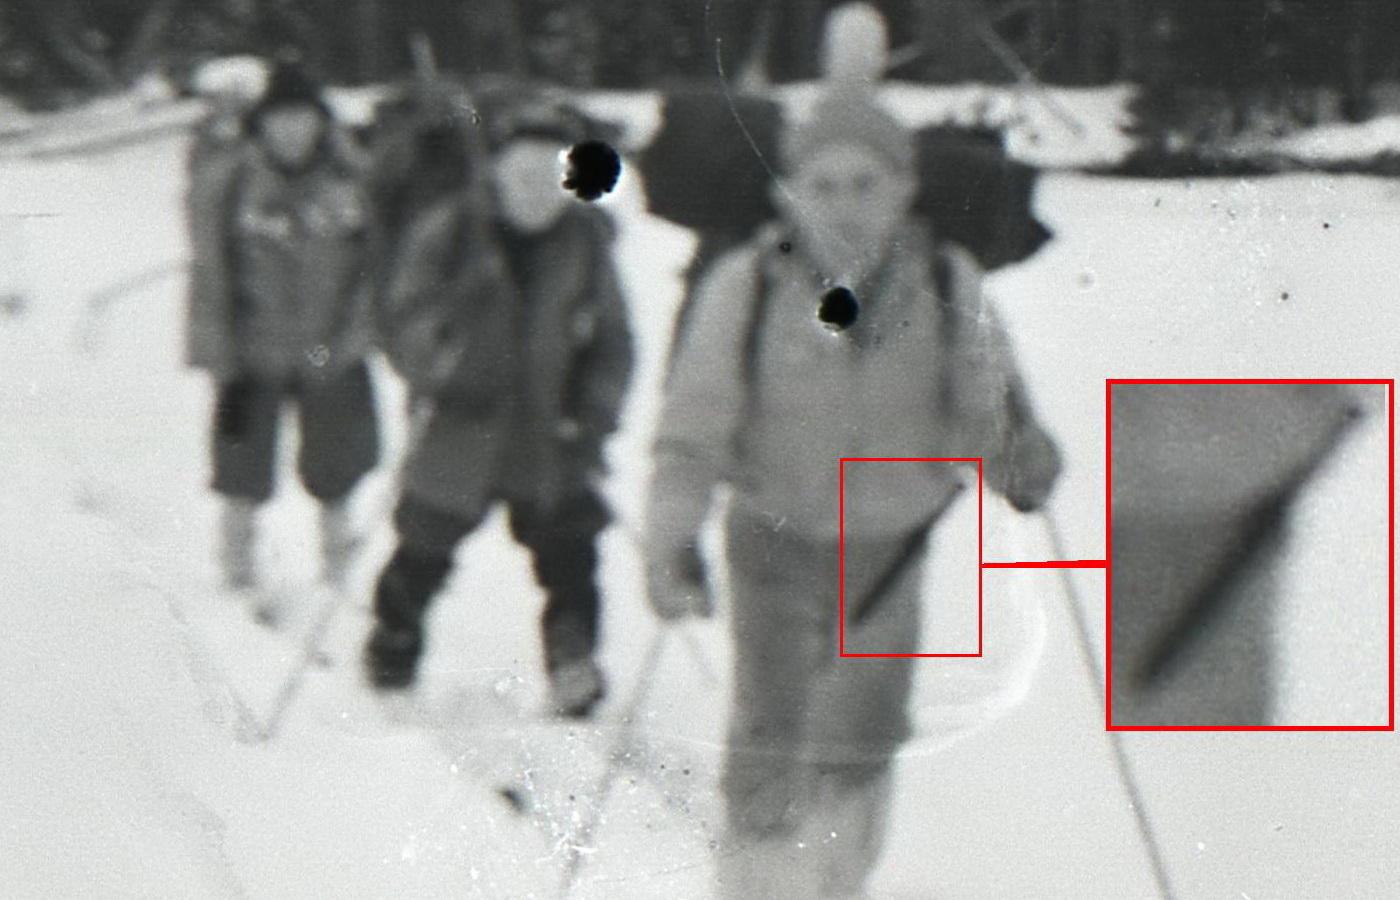 https://imageup.ru/img201/3658019/foto-07.jpg